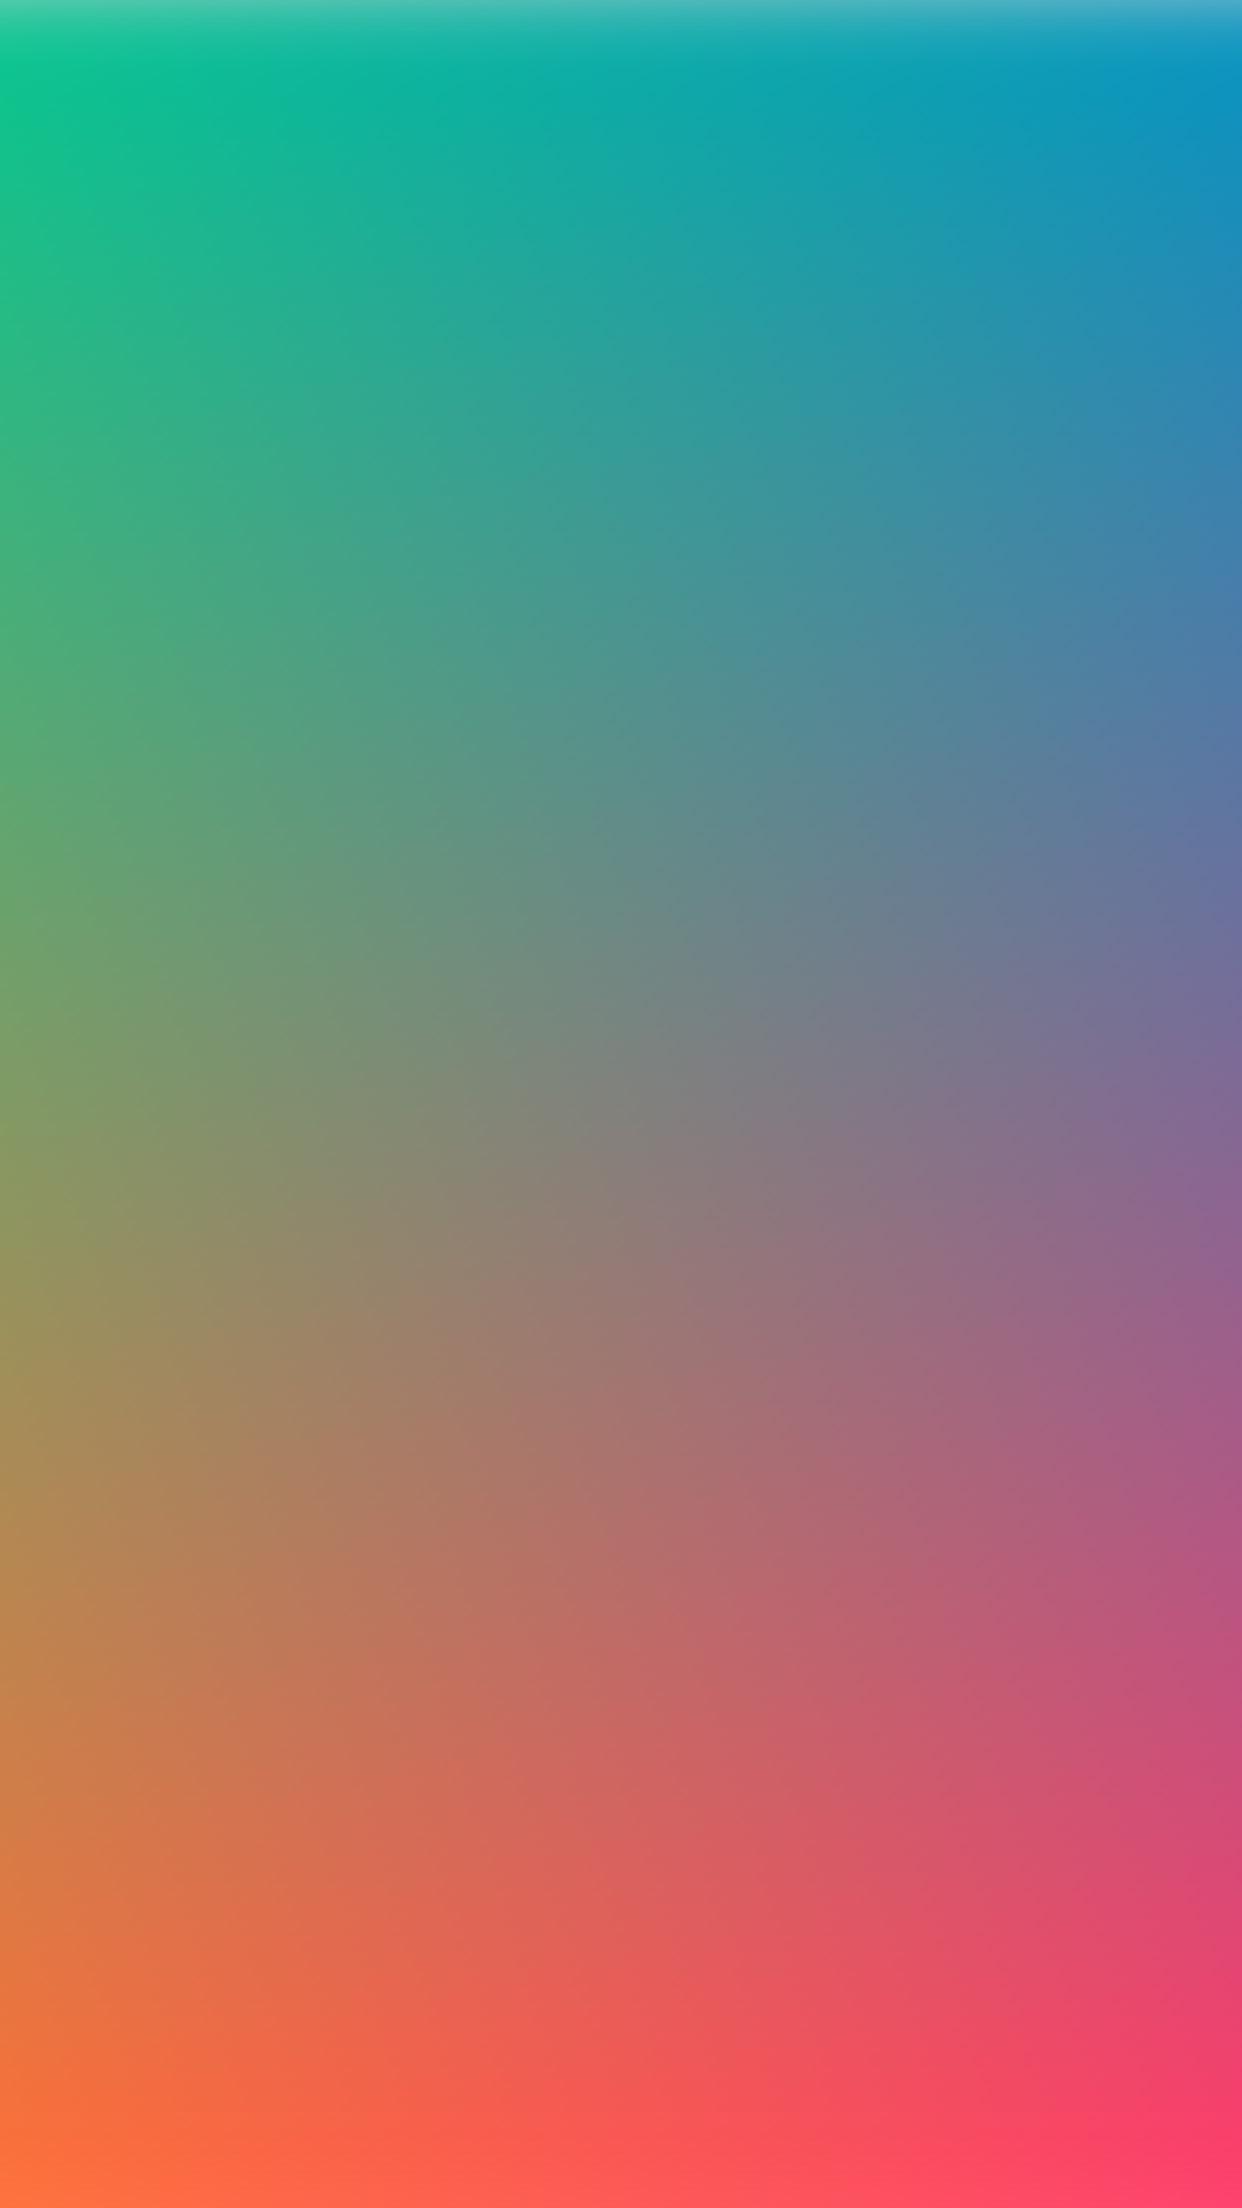 Iphone wallpaper sl86 color rainbow blur - Color gradation wallpaper ...